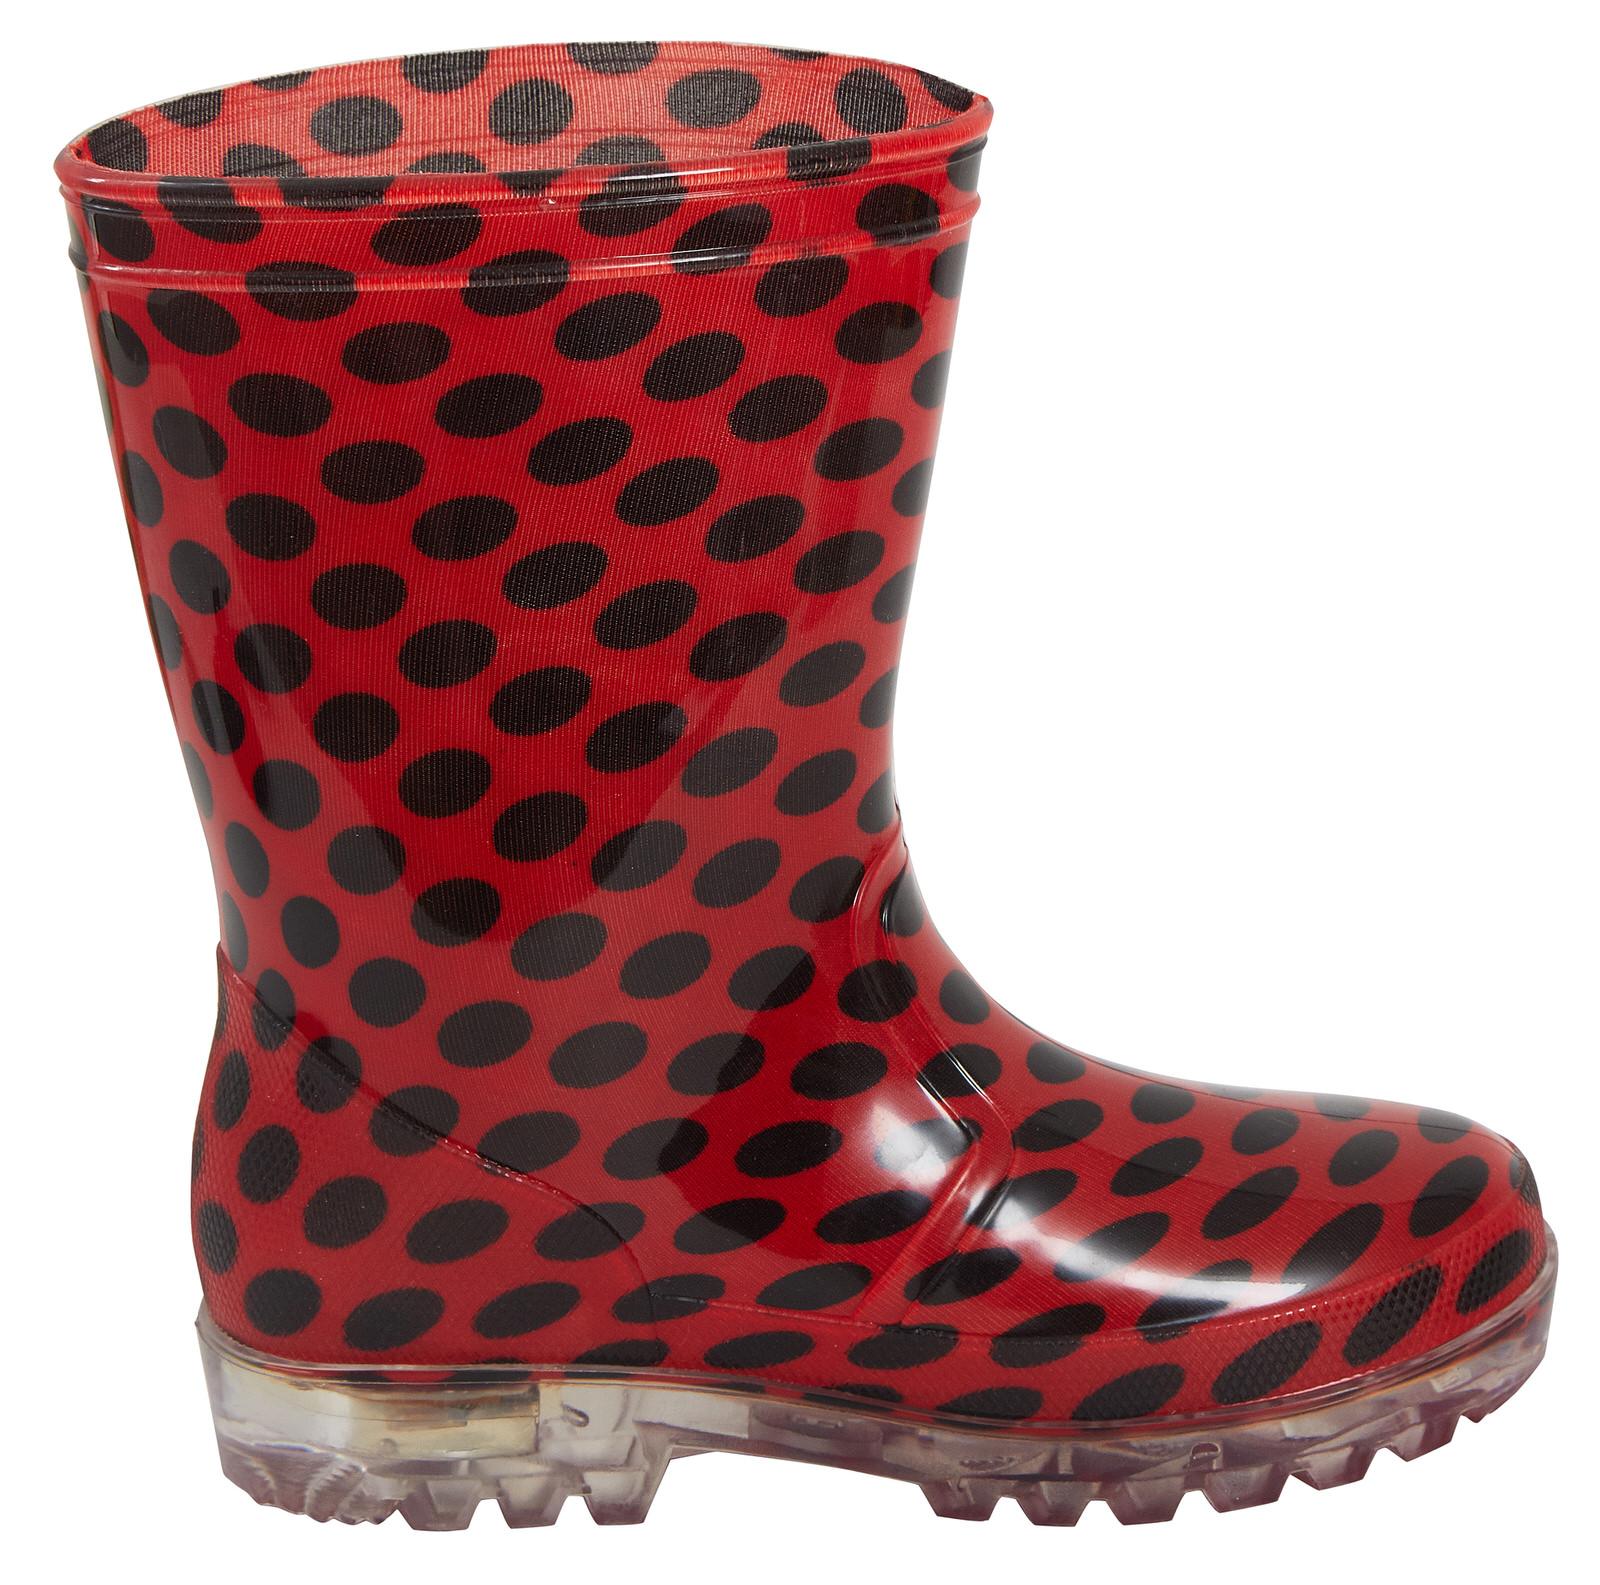 Miraculous Ladybug Girls Light Up Wellington Boots Kids Flashing Snow Wellies